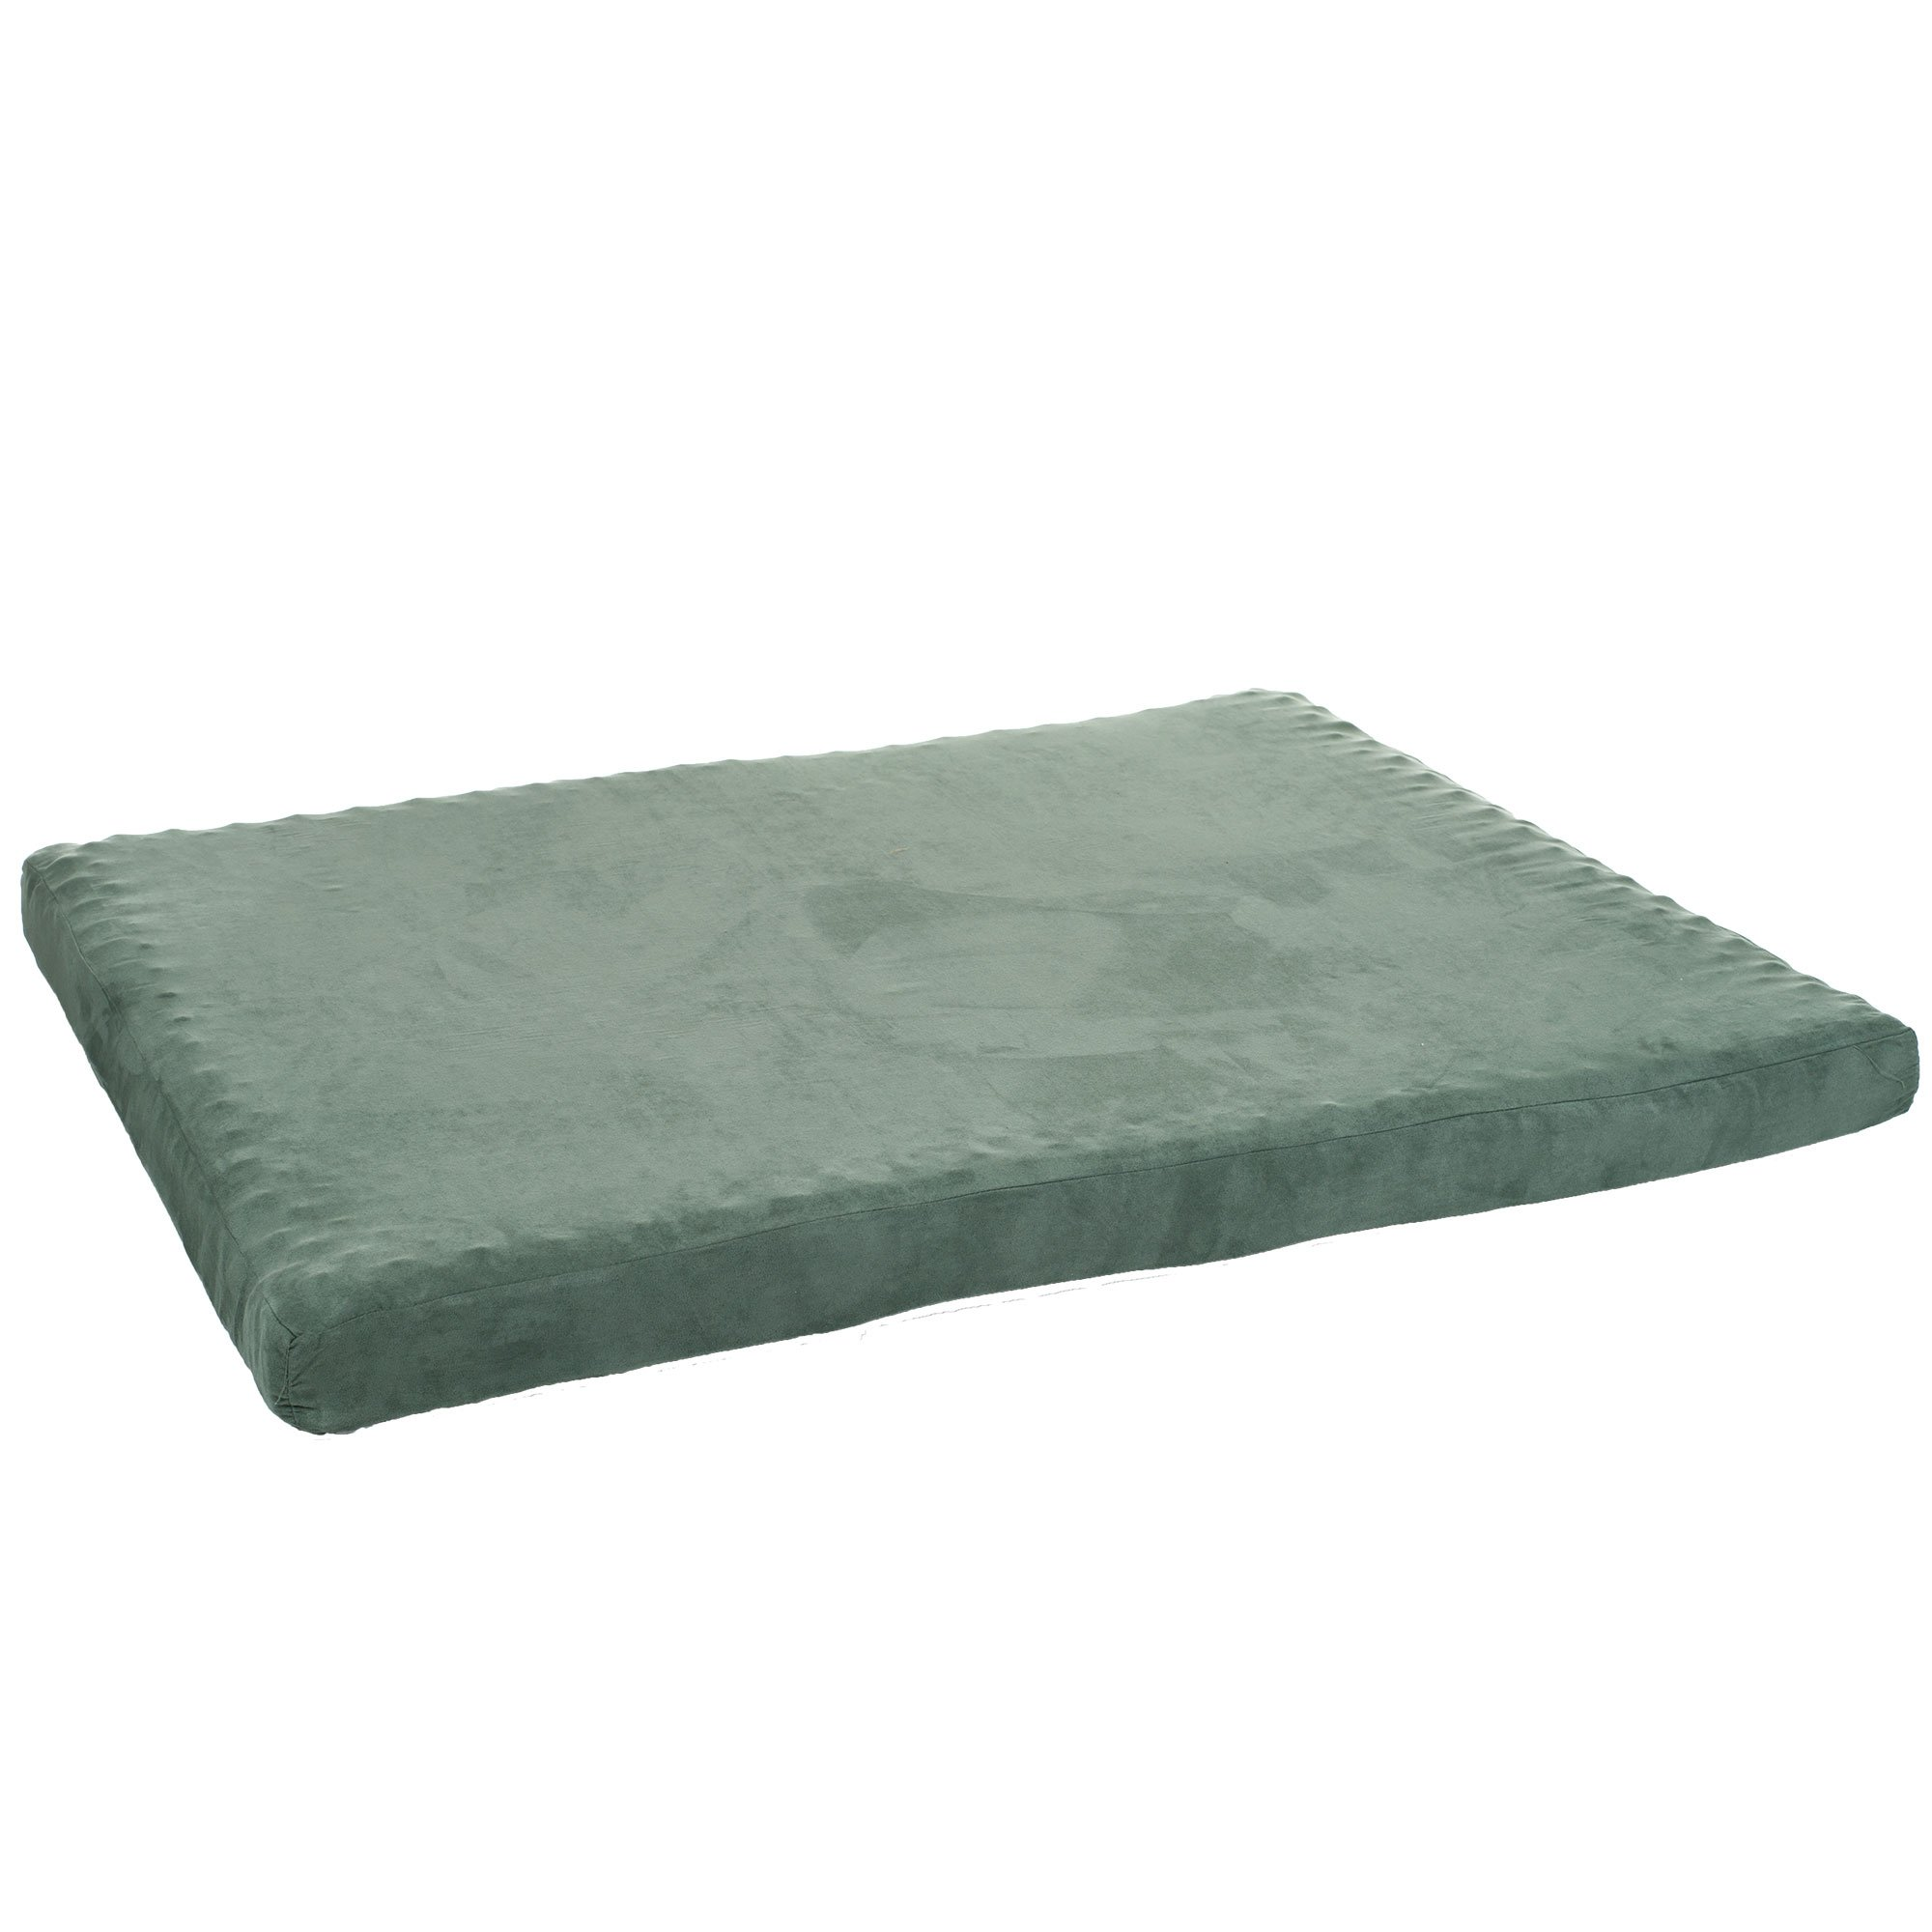 PETMAKER Orthopedic Super Foam Pet Bed - 25.5 x 19 inches - Forest